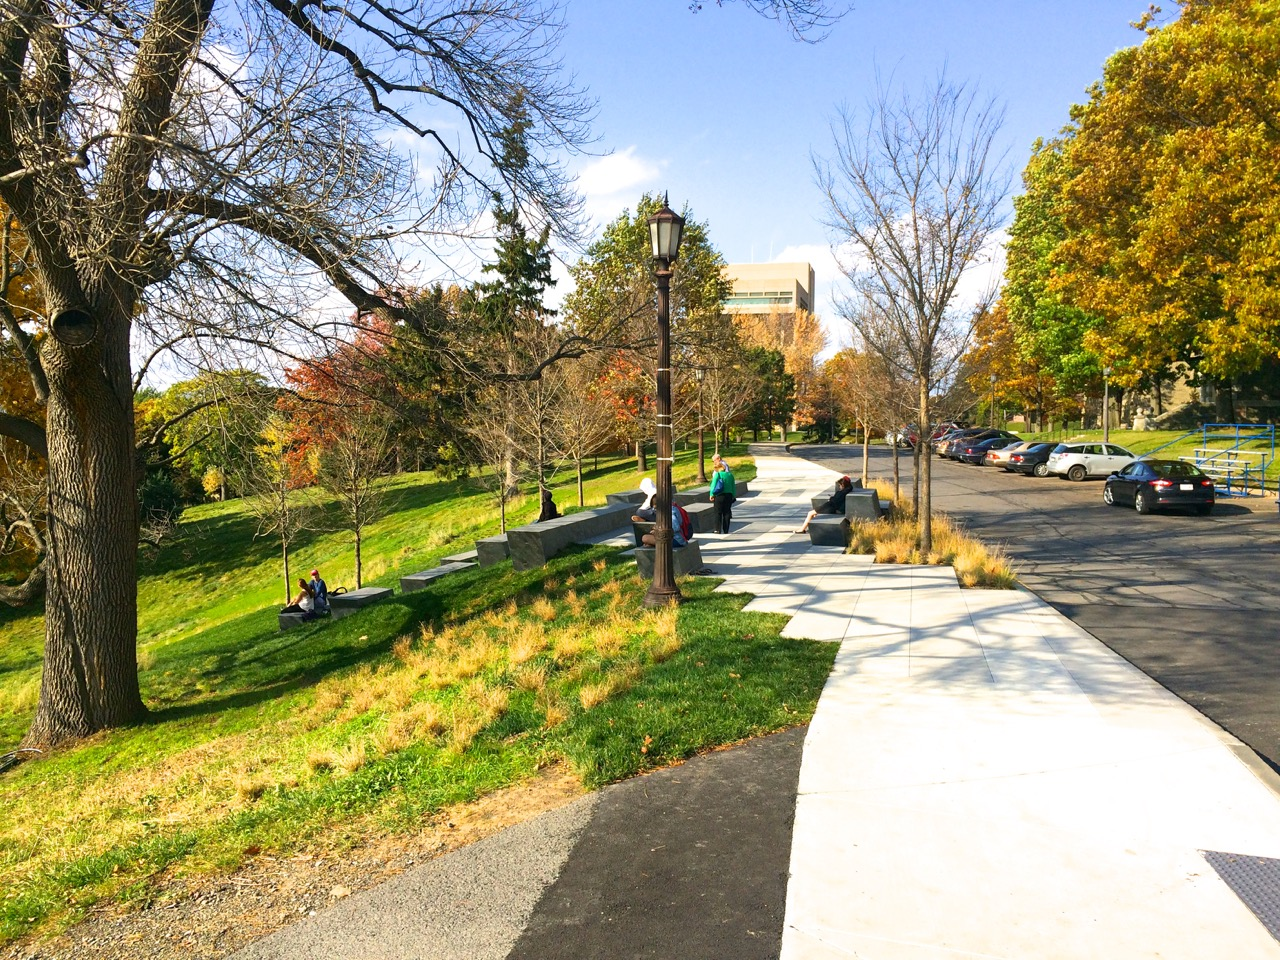 Sesquicentennial-Grove-Cornell-10-17-1412